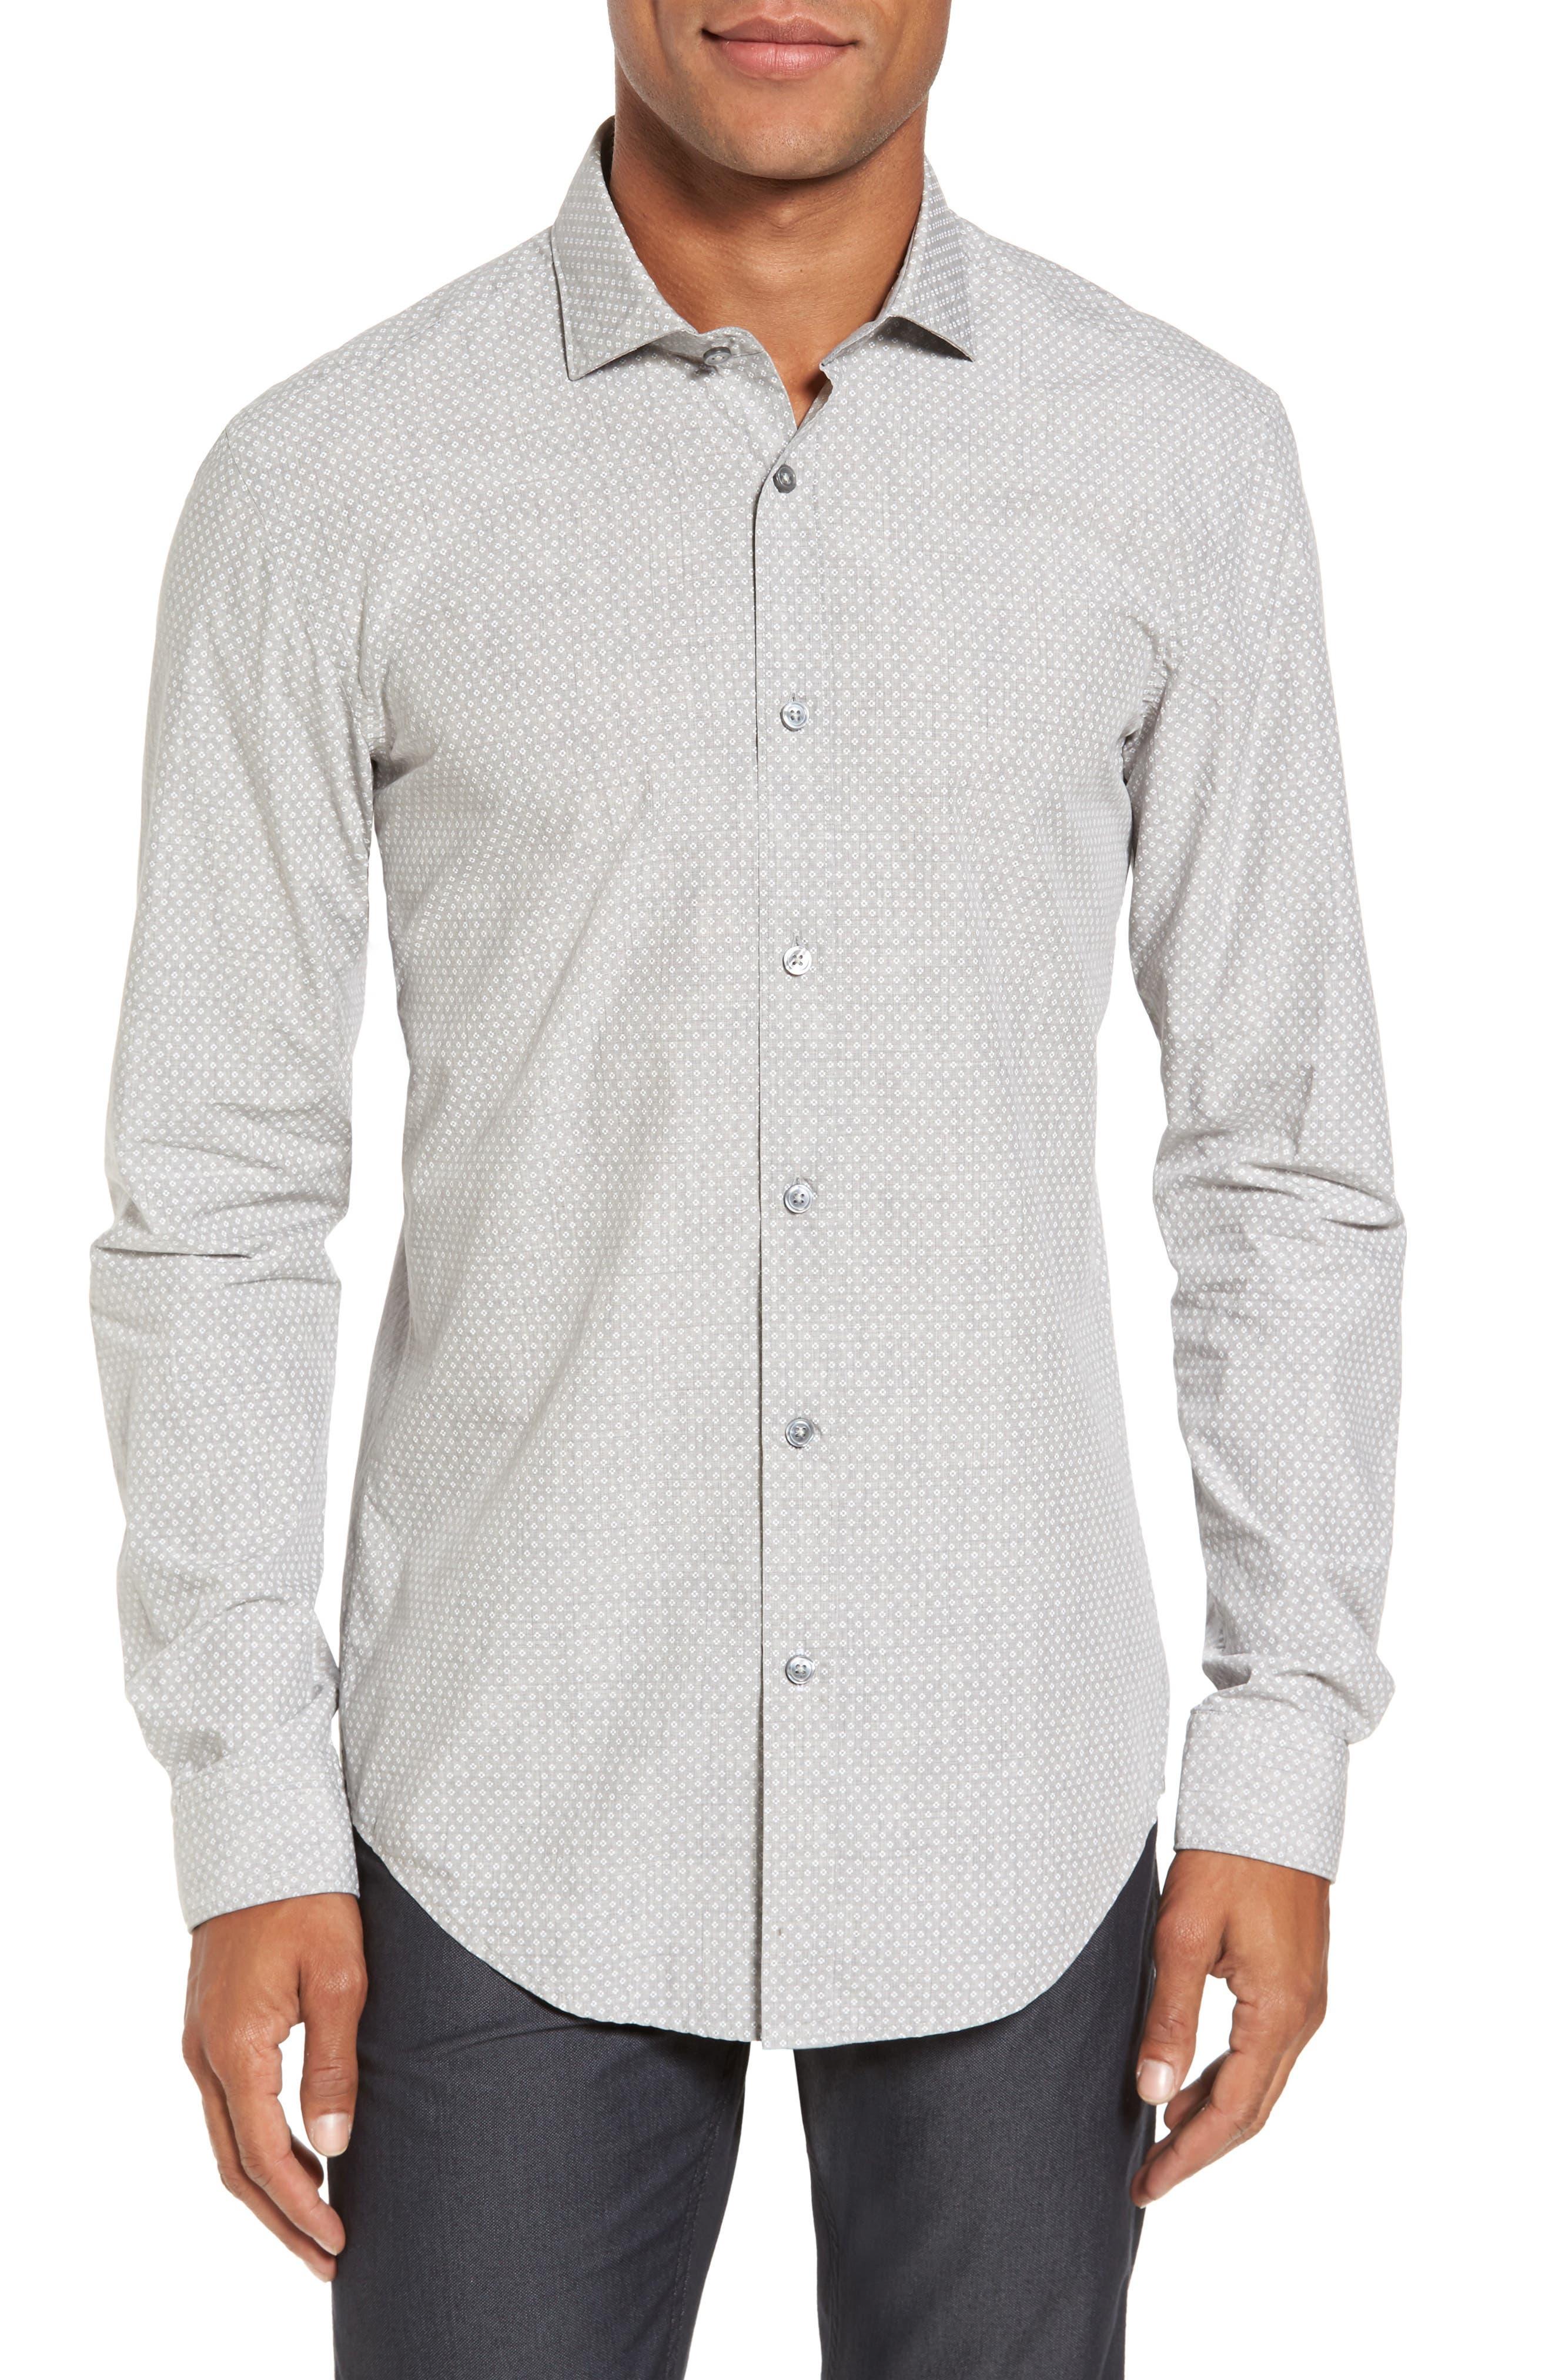 Ridley Slim Fit Micro Diamond Sport Shirt,                             Main thumbnail 1, color,                             030